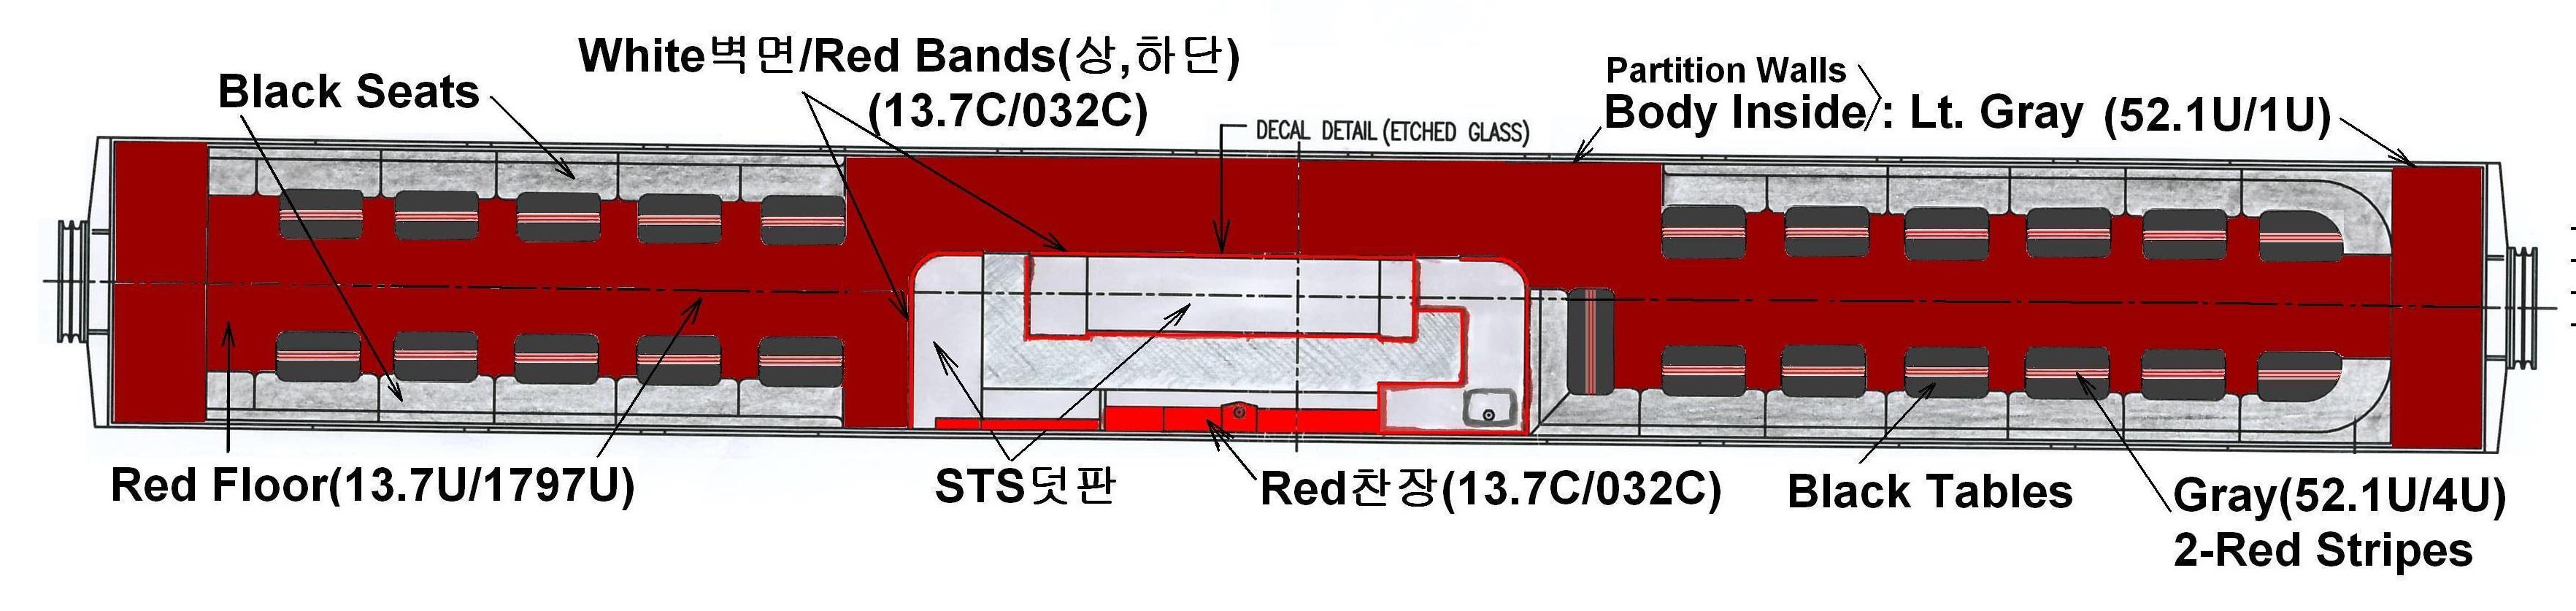 NH RR 5200 series grill car diagram 1.jpeg